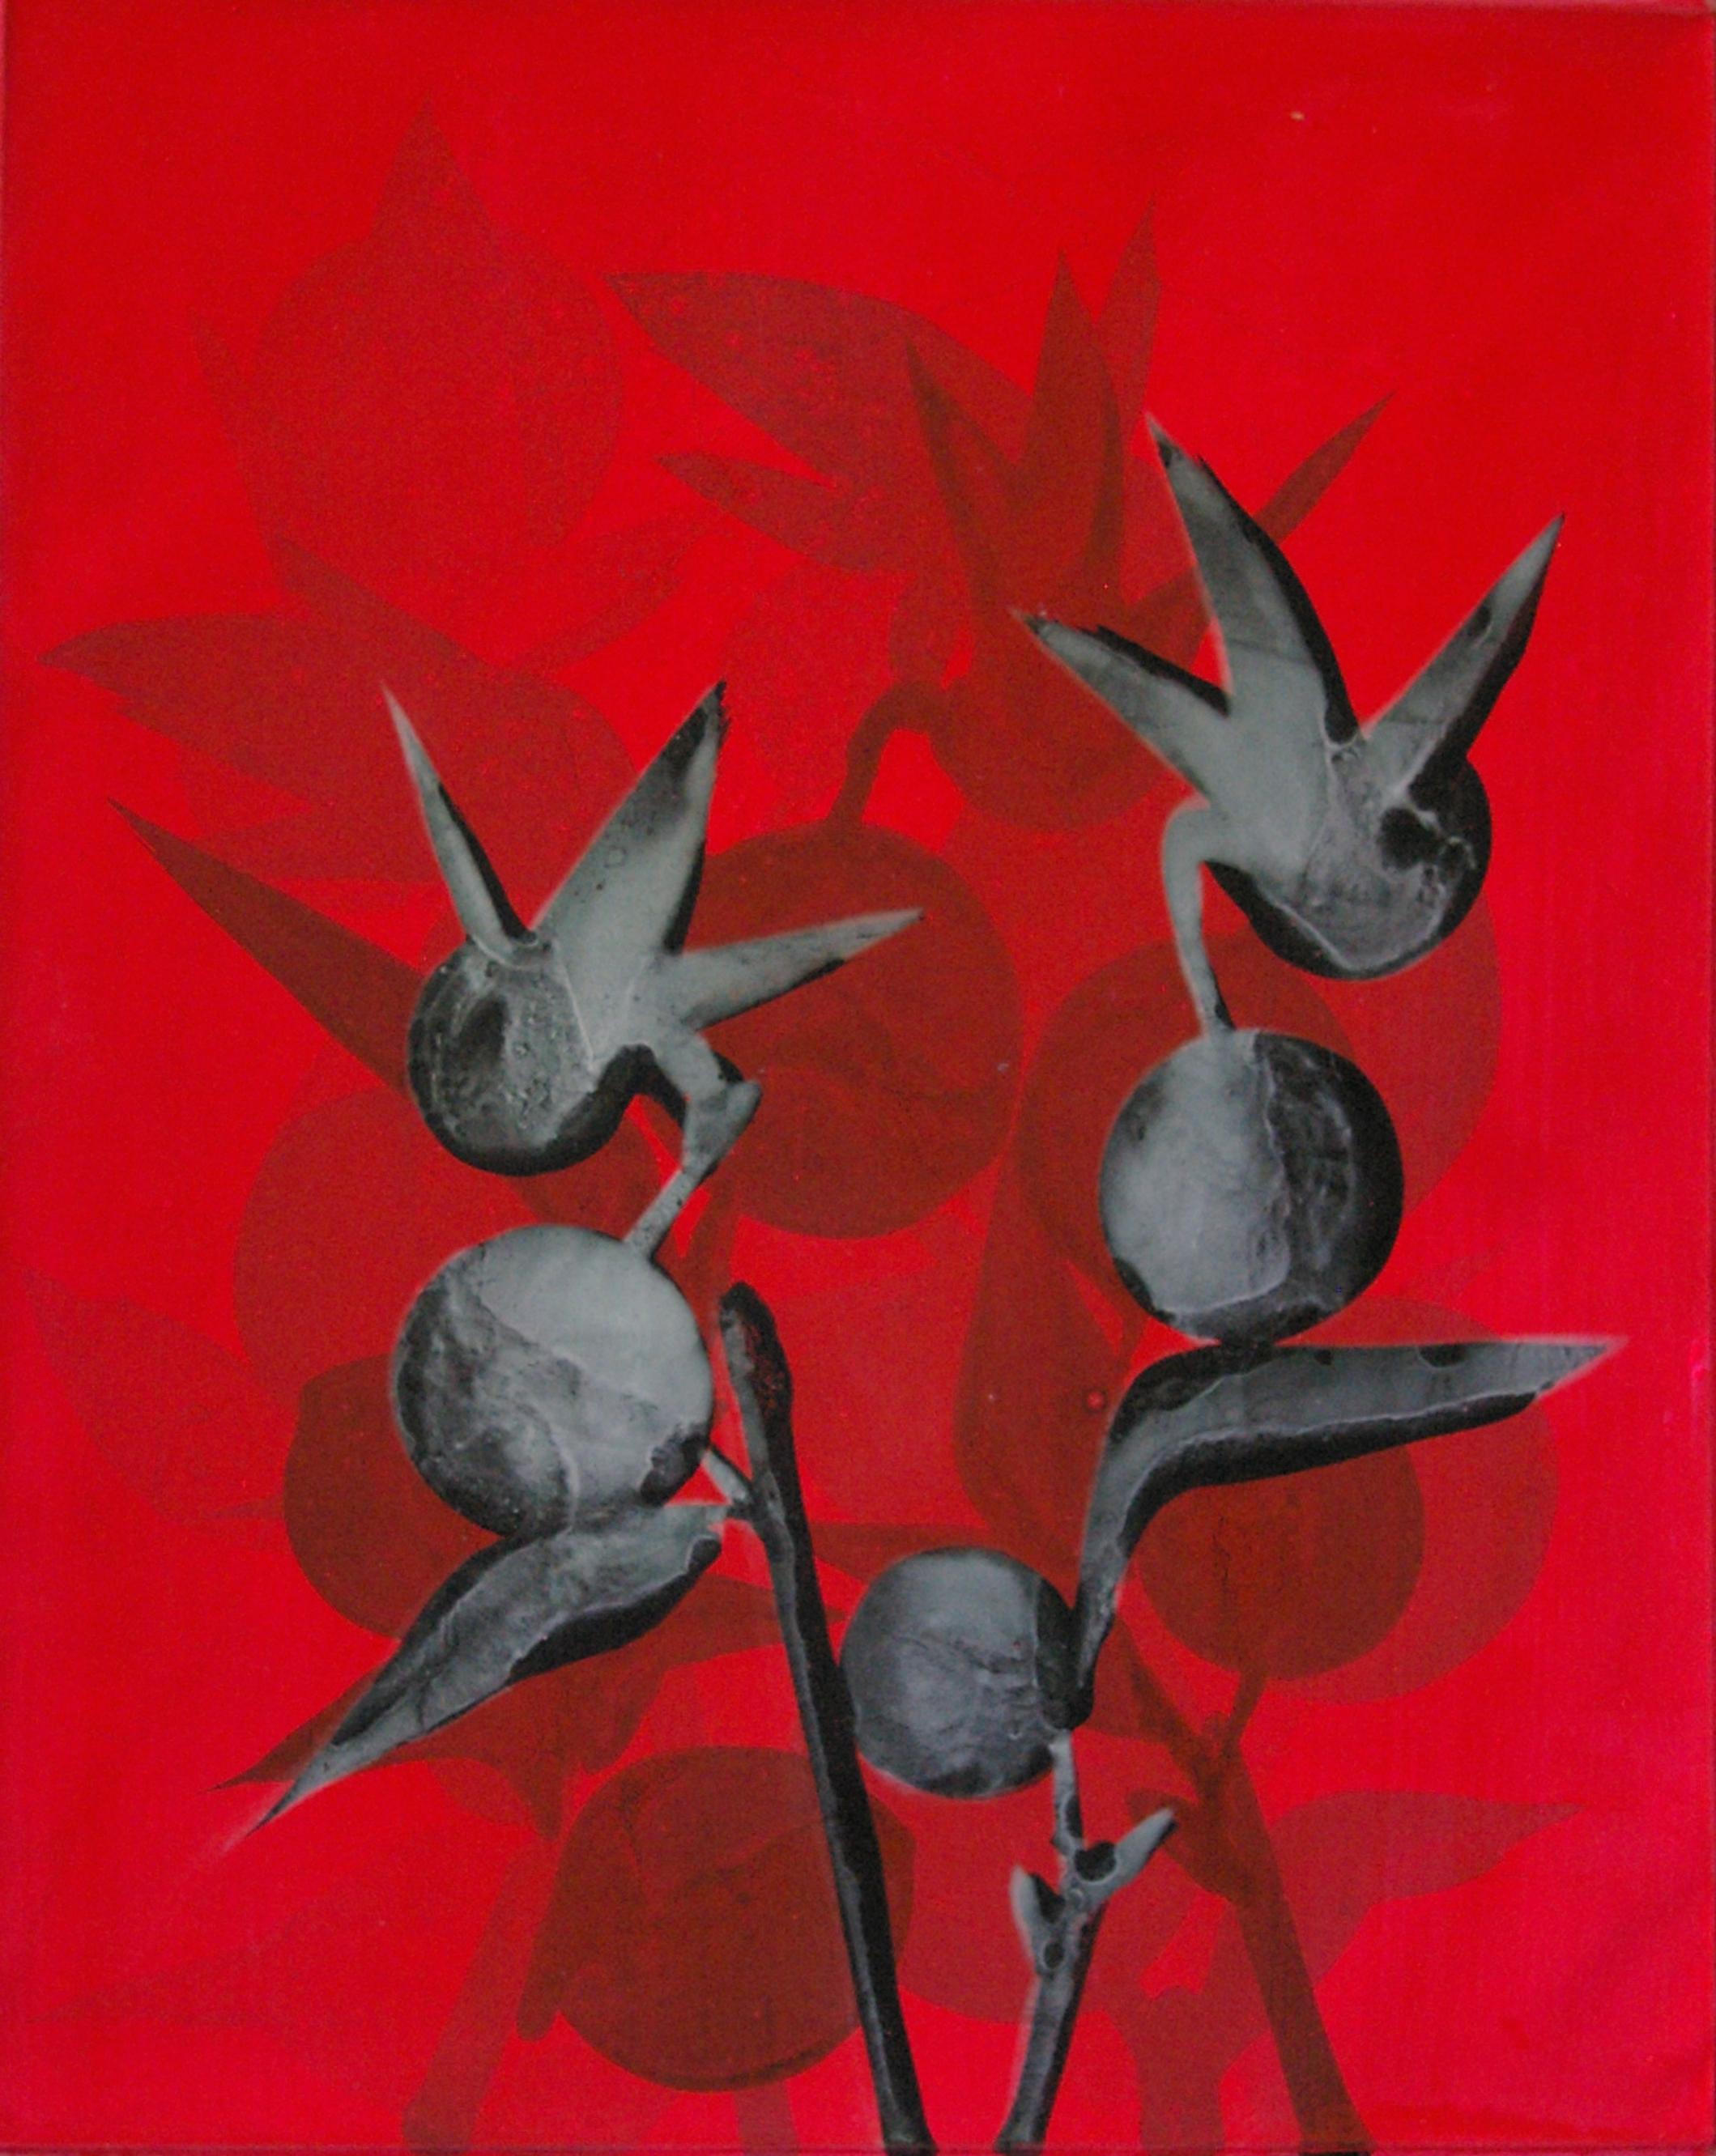 SoHyun Bae, Persimmons and Birds #2, 2007, acrylic on canvas, 80 x 60 cm